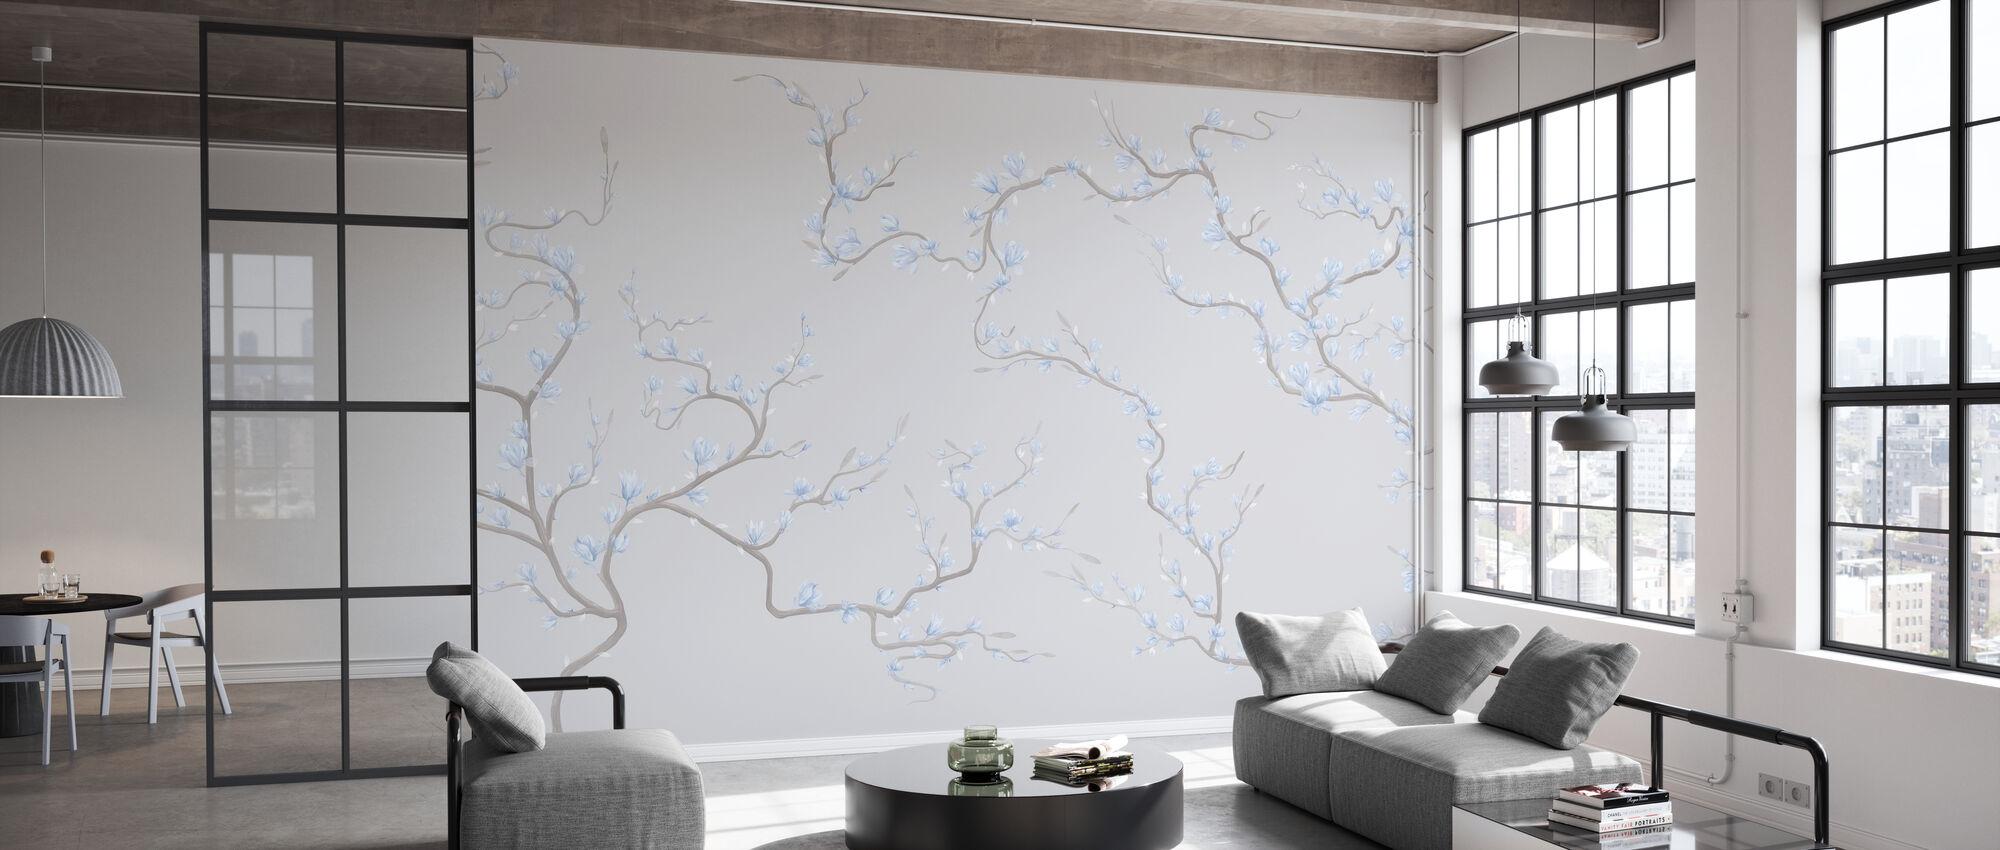 Flourishing Magnolia - Soft Gray - Wallpaper - Office